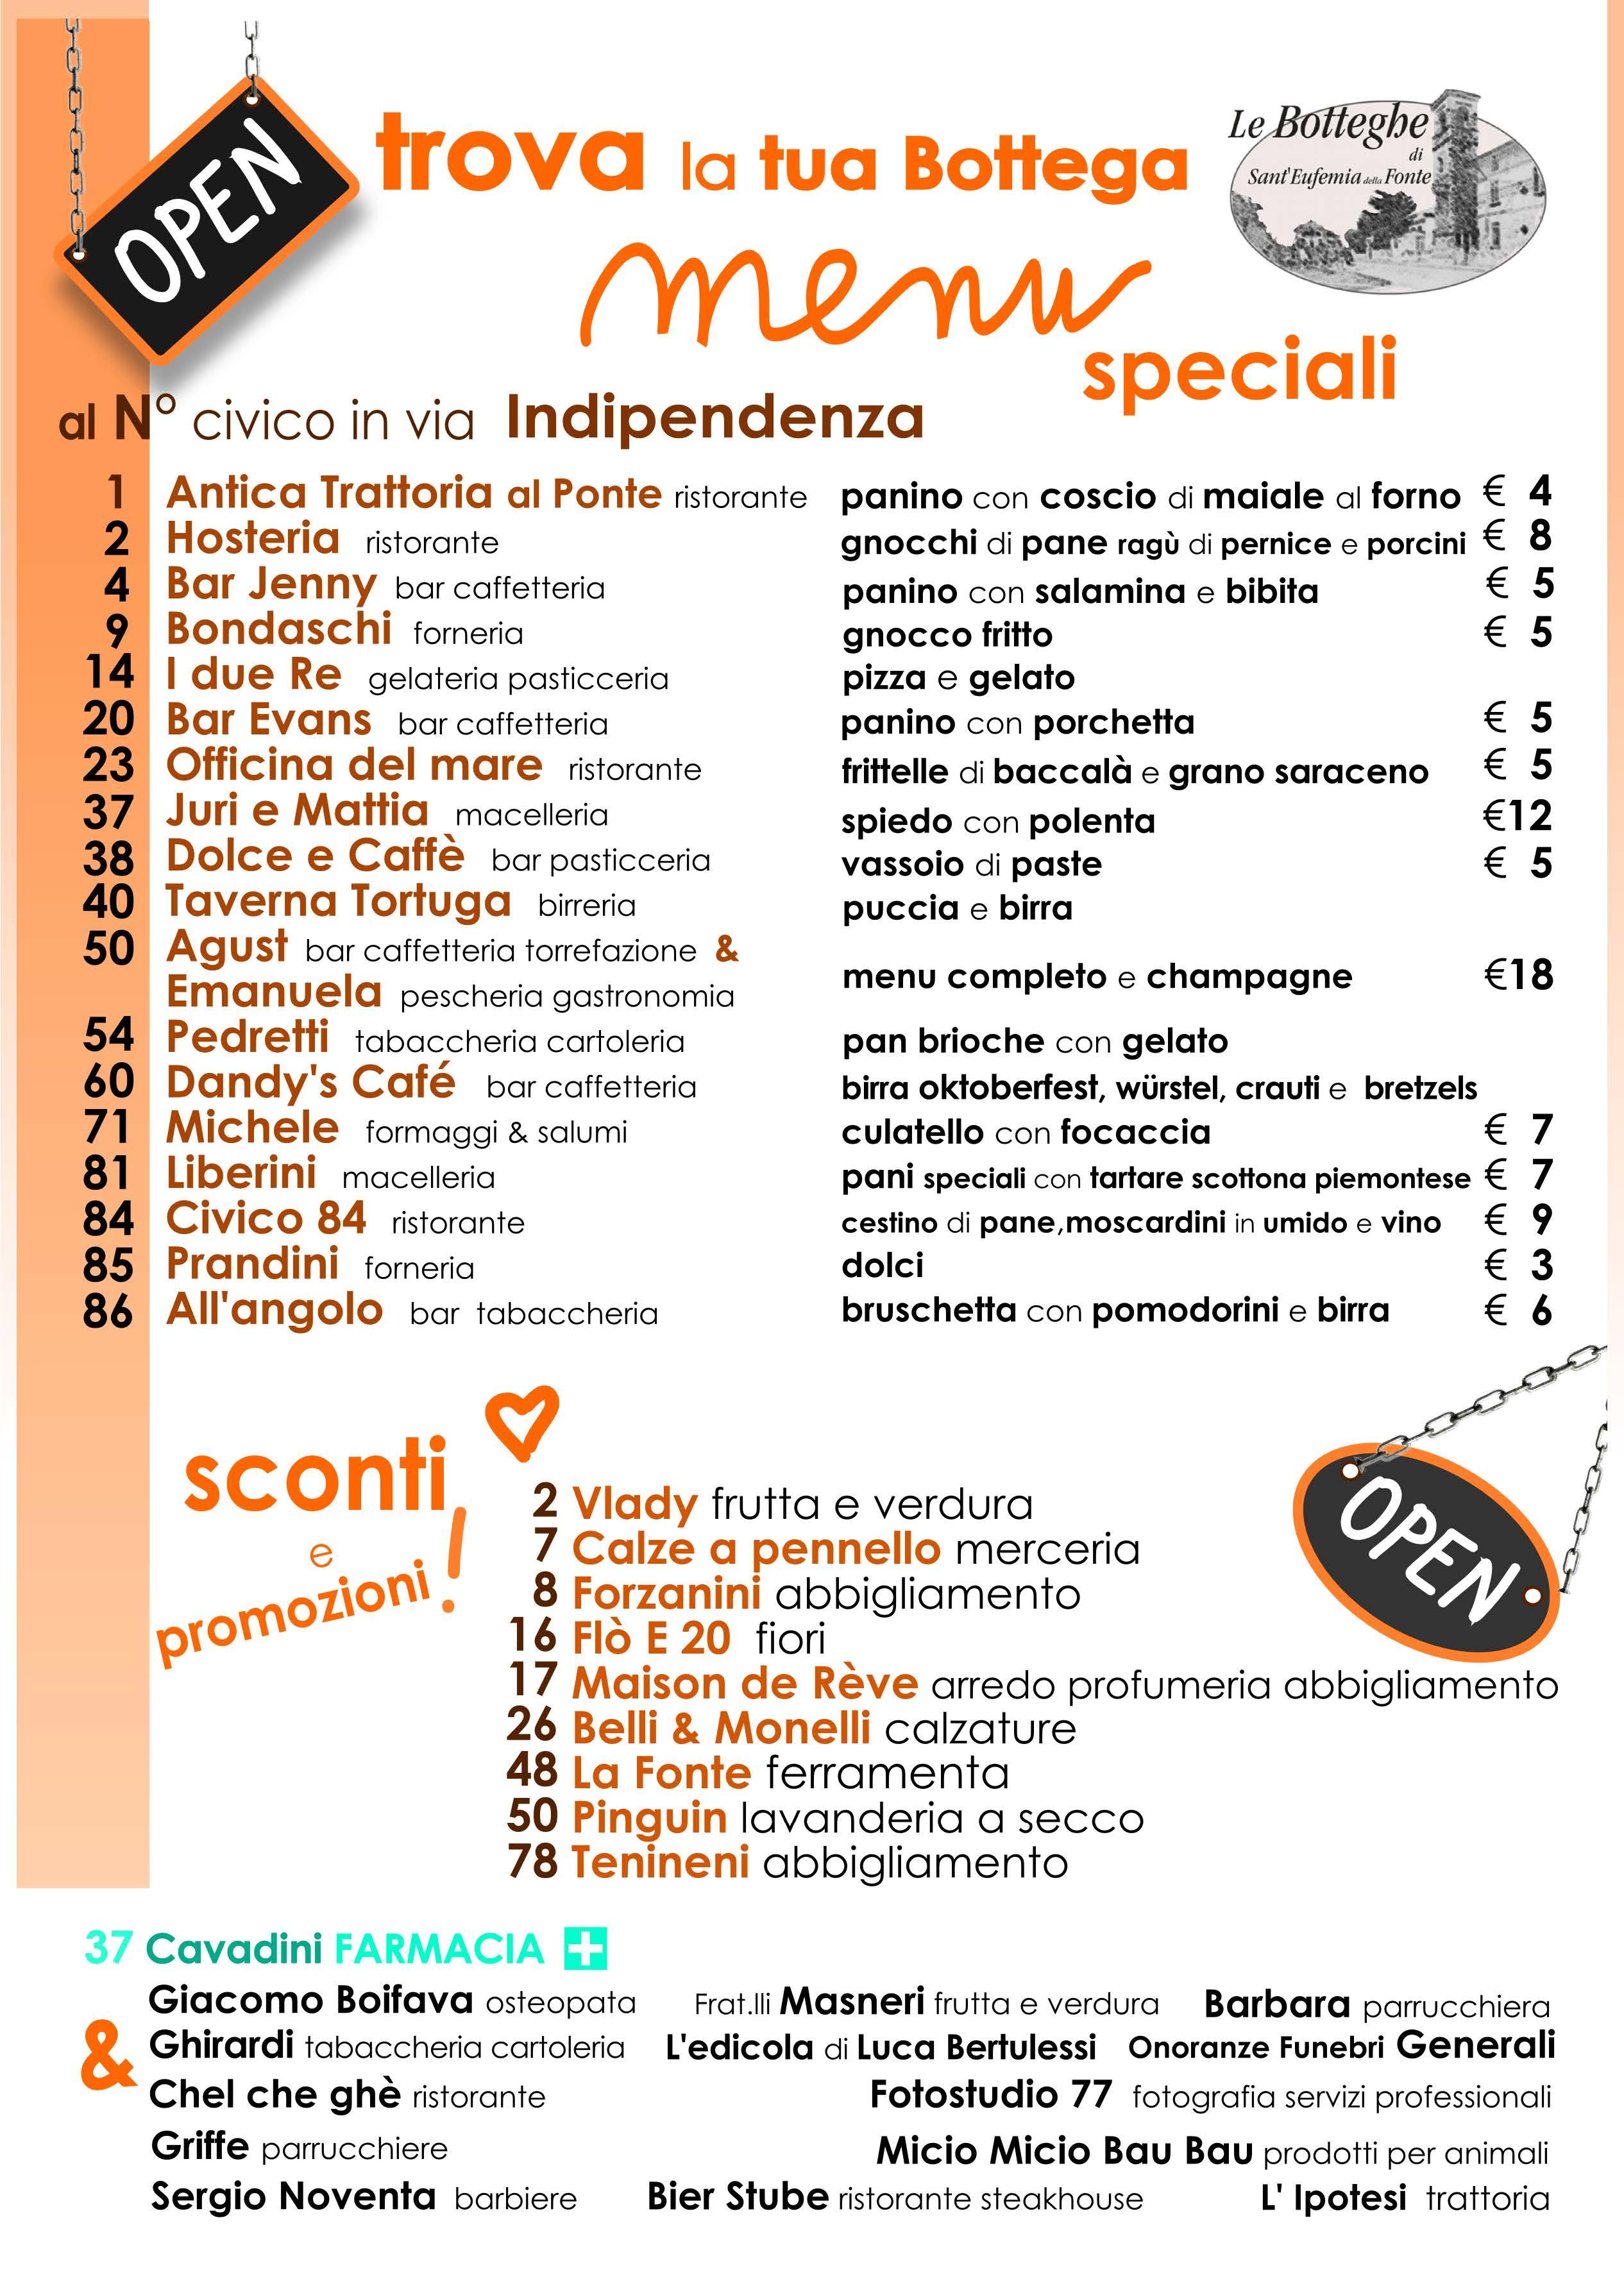 ASSA 18 RETRO stampaprint